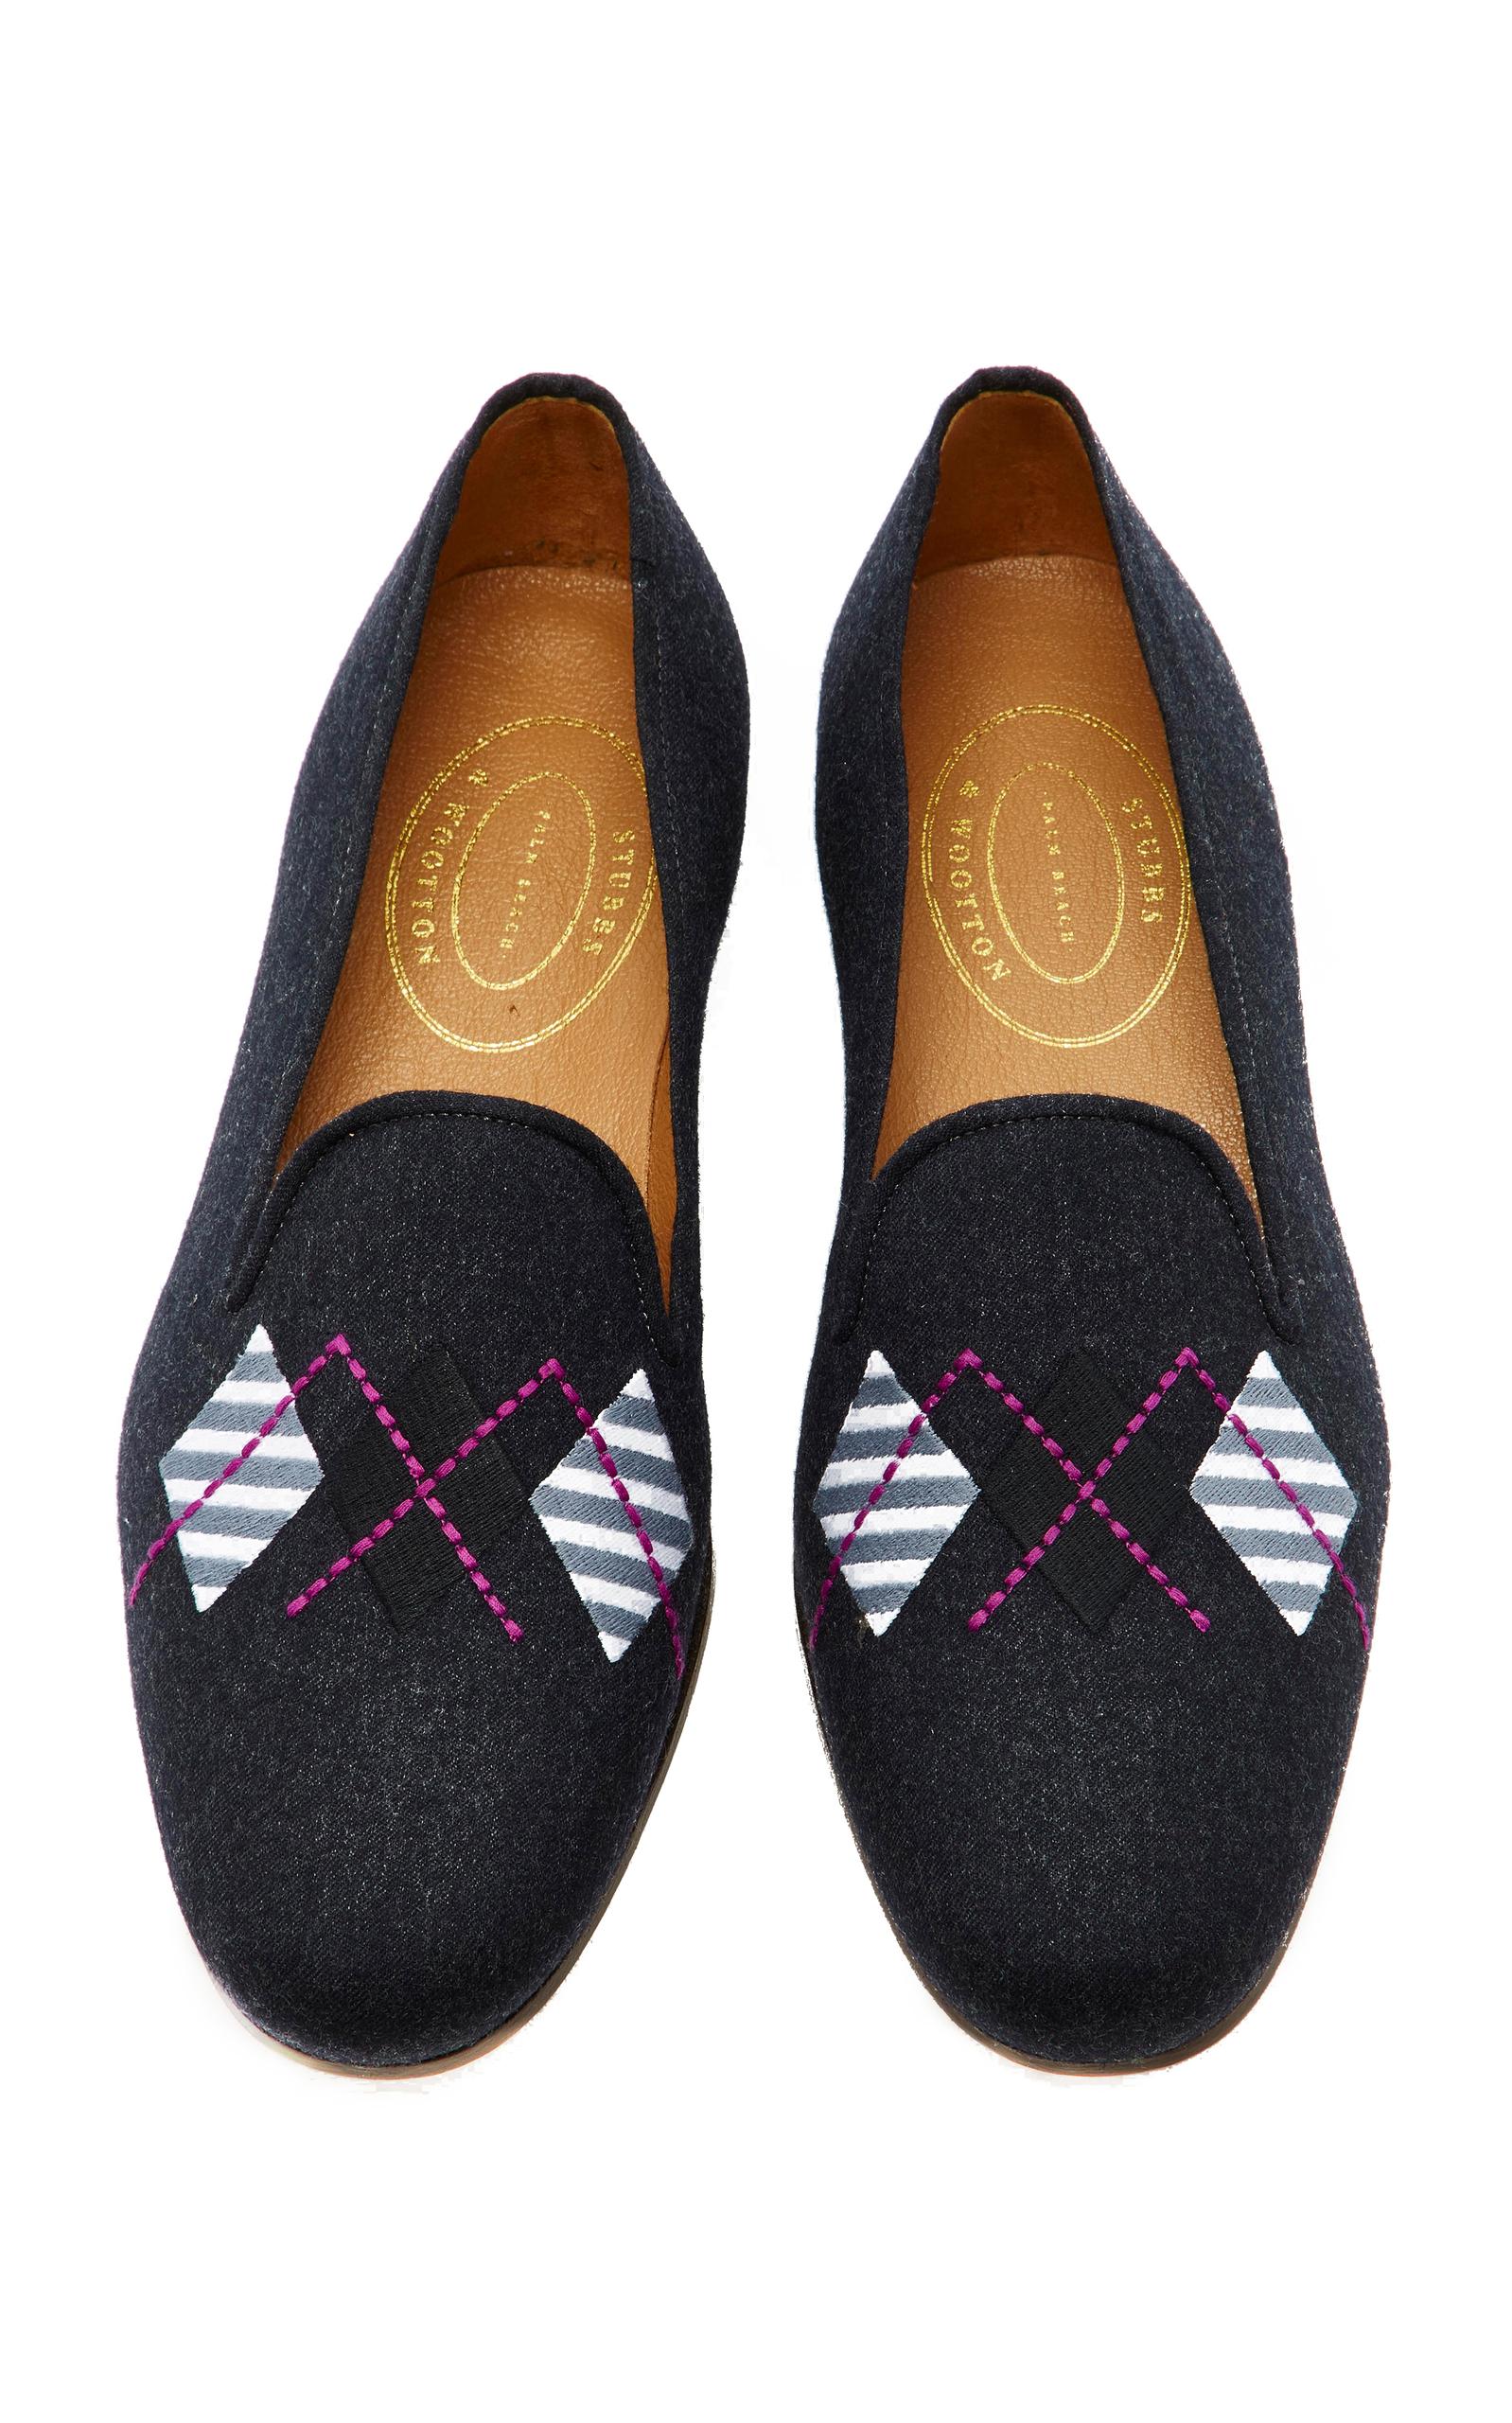 large_stubbs-wootton-grey-argyle-striped-slipper.jpg (1598×2560)